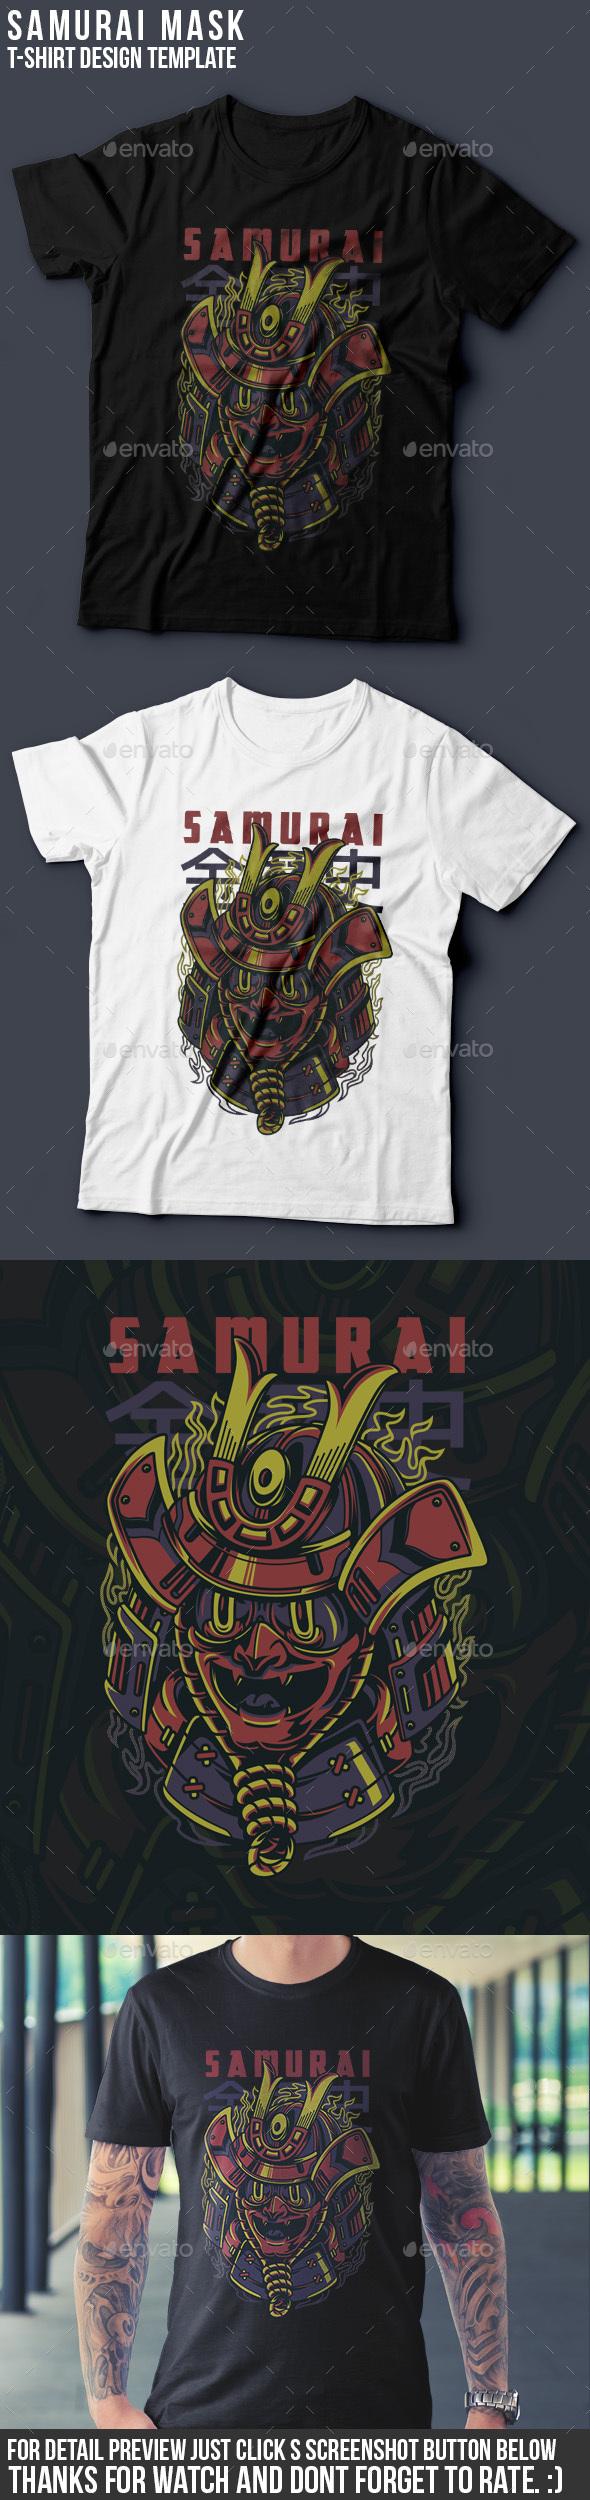 Samurai Mask T-Shirt Design - Grunge Designs